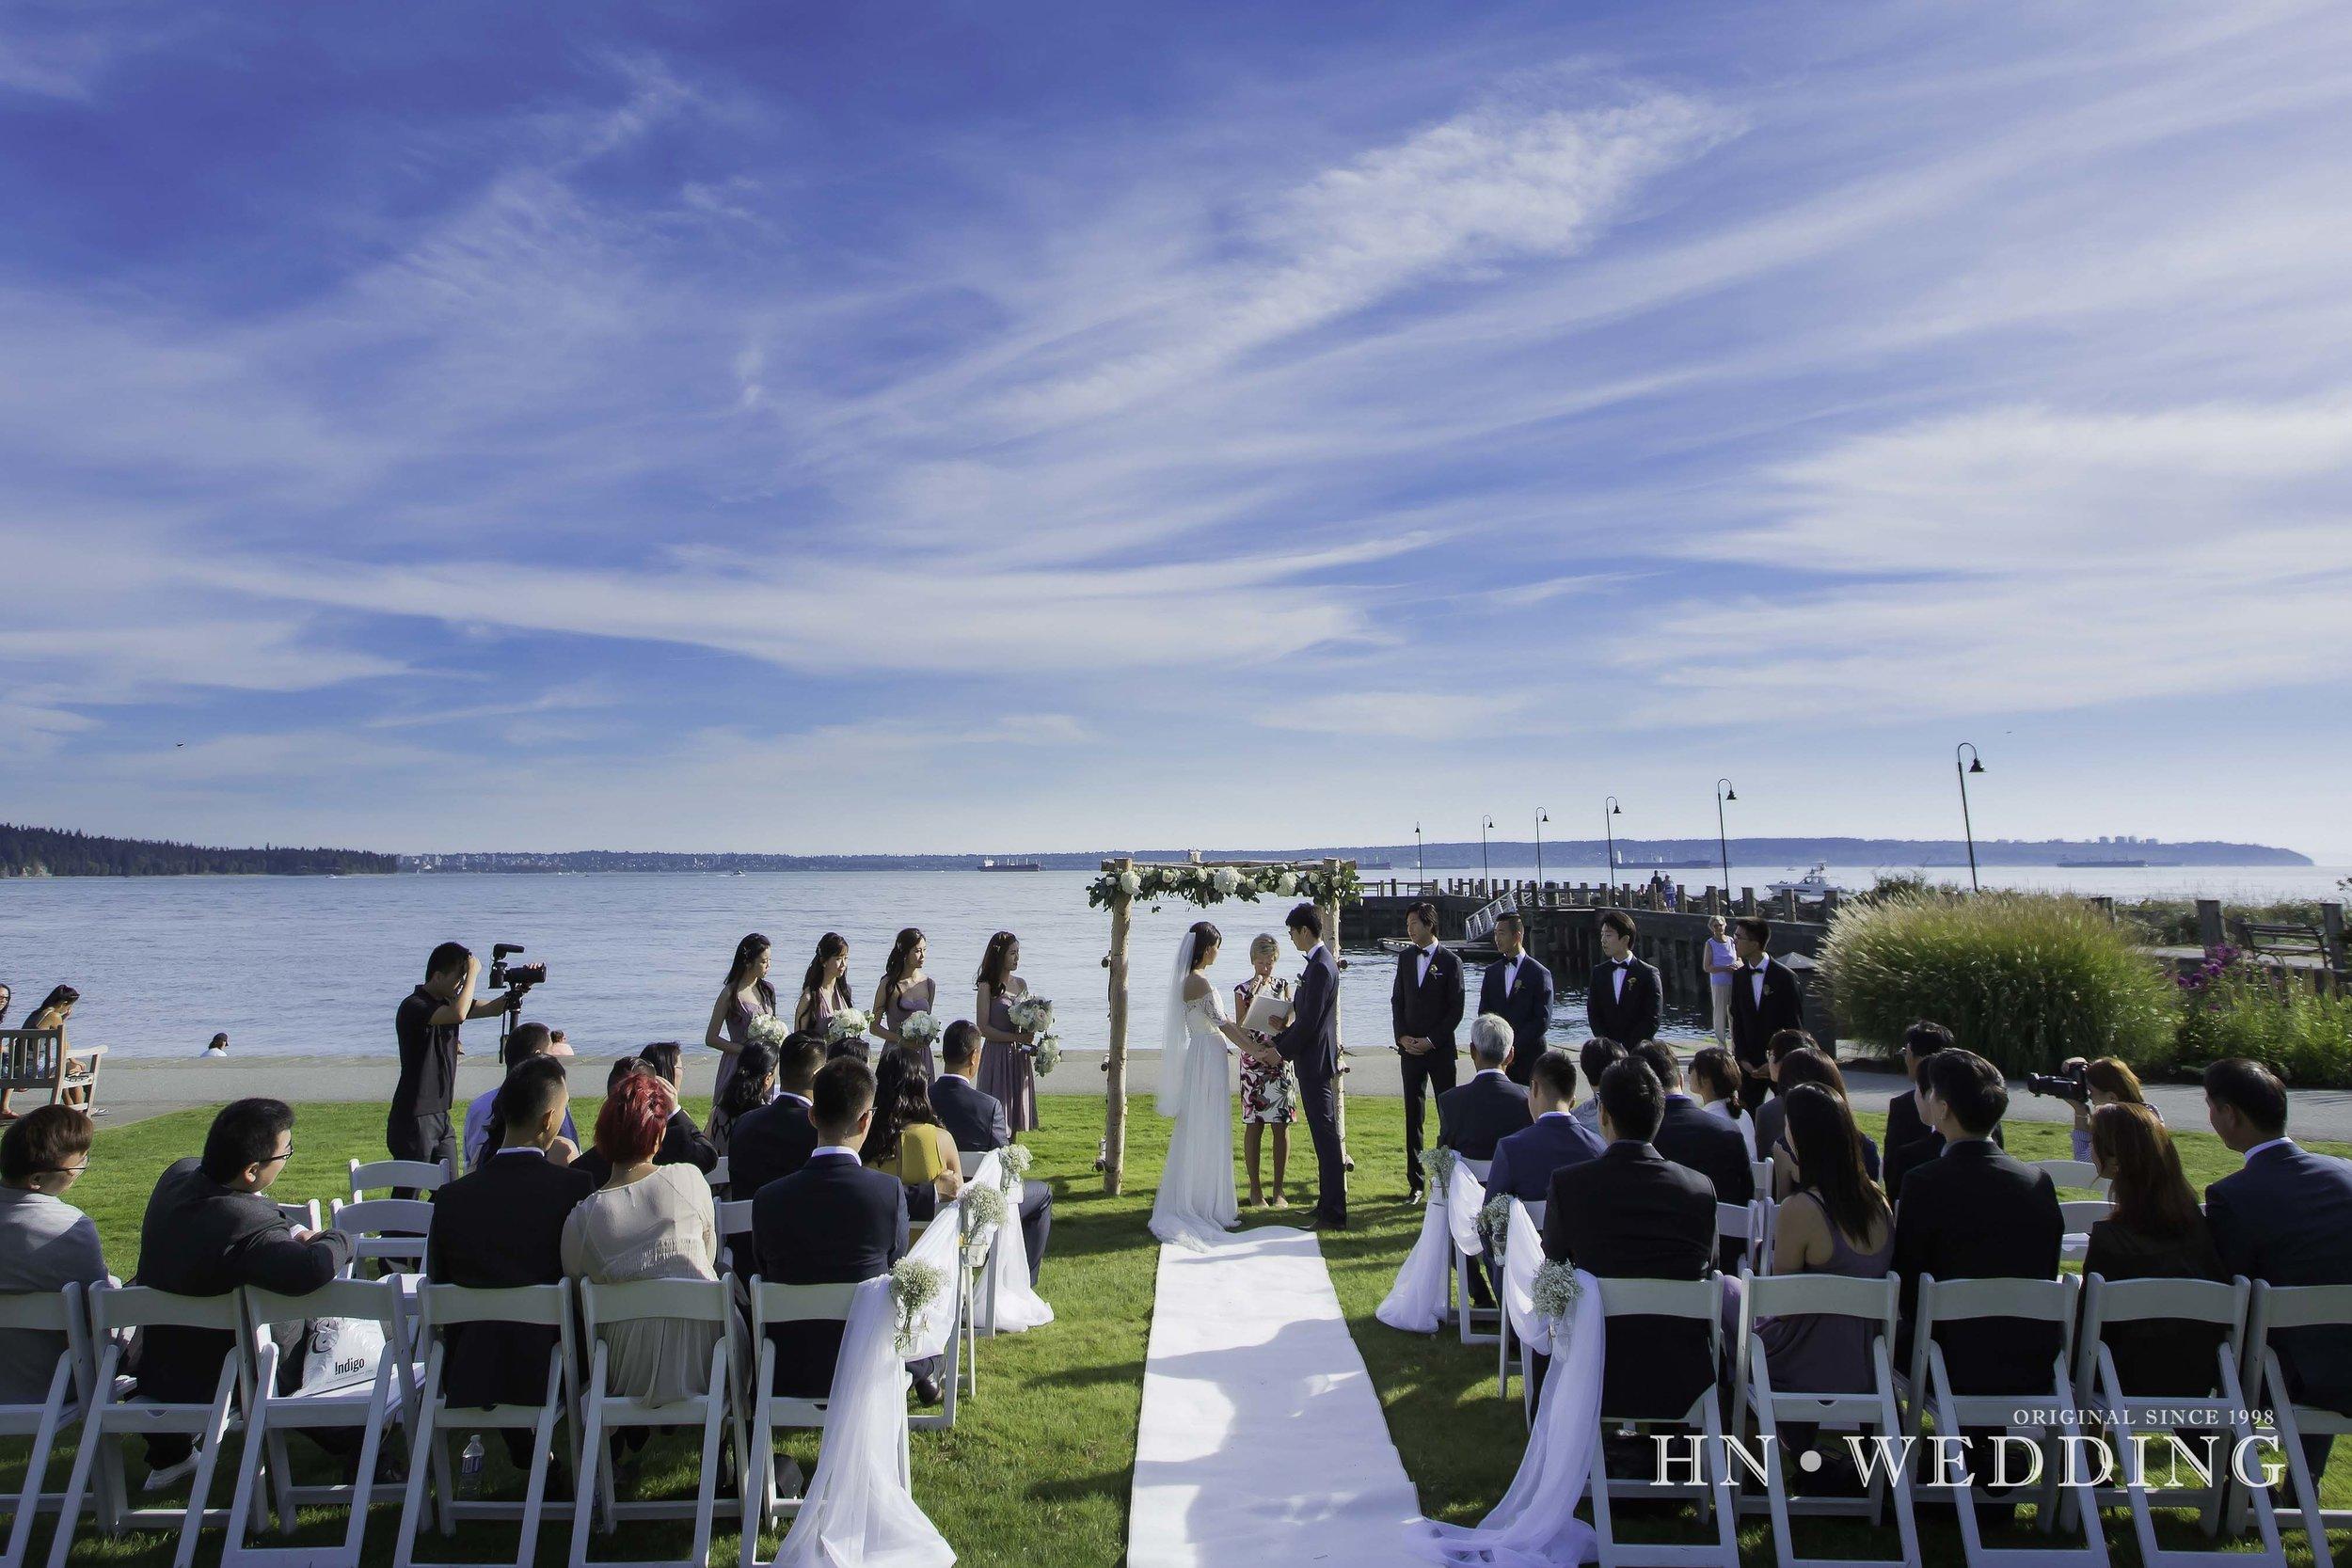 HNwedding-20160826-wedding-1883.jpg